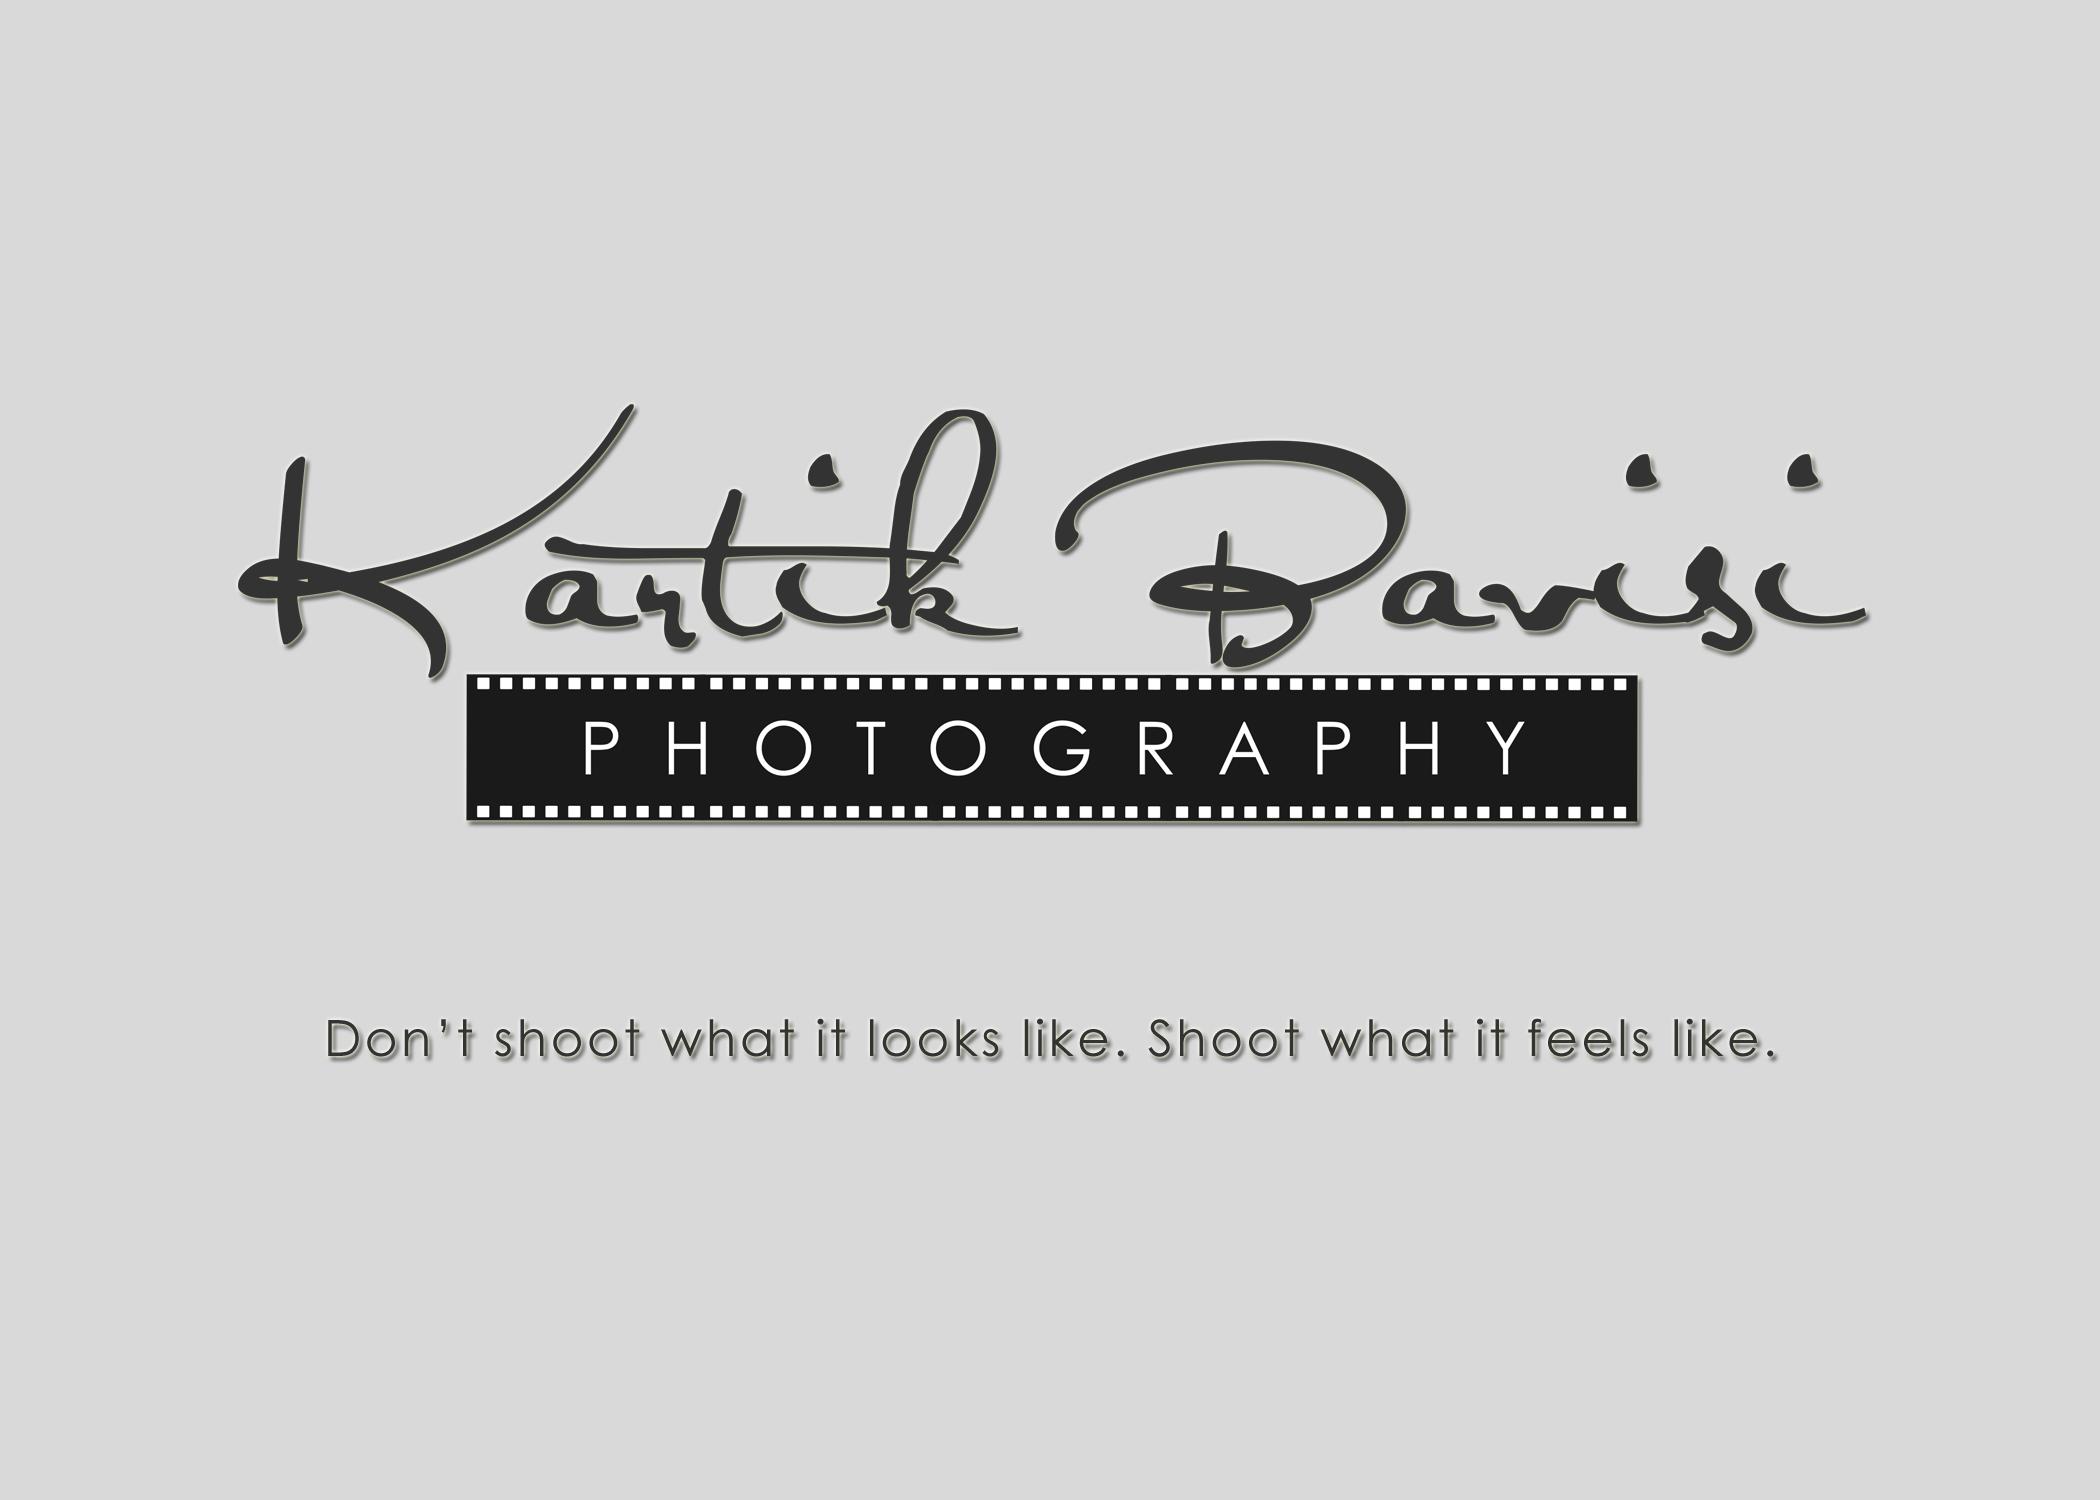 Kartik Bavisi Photography Logo